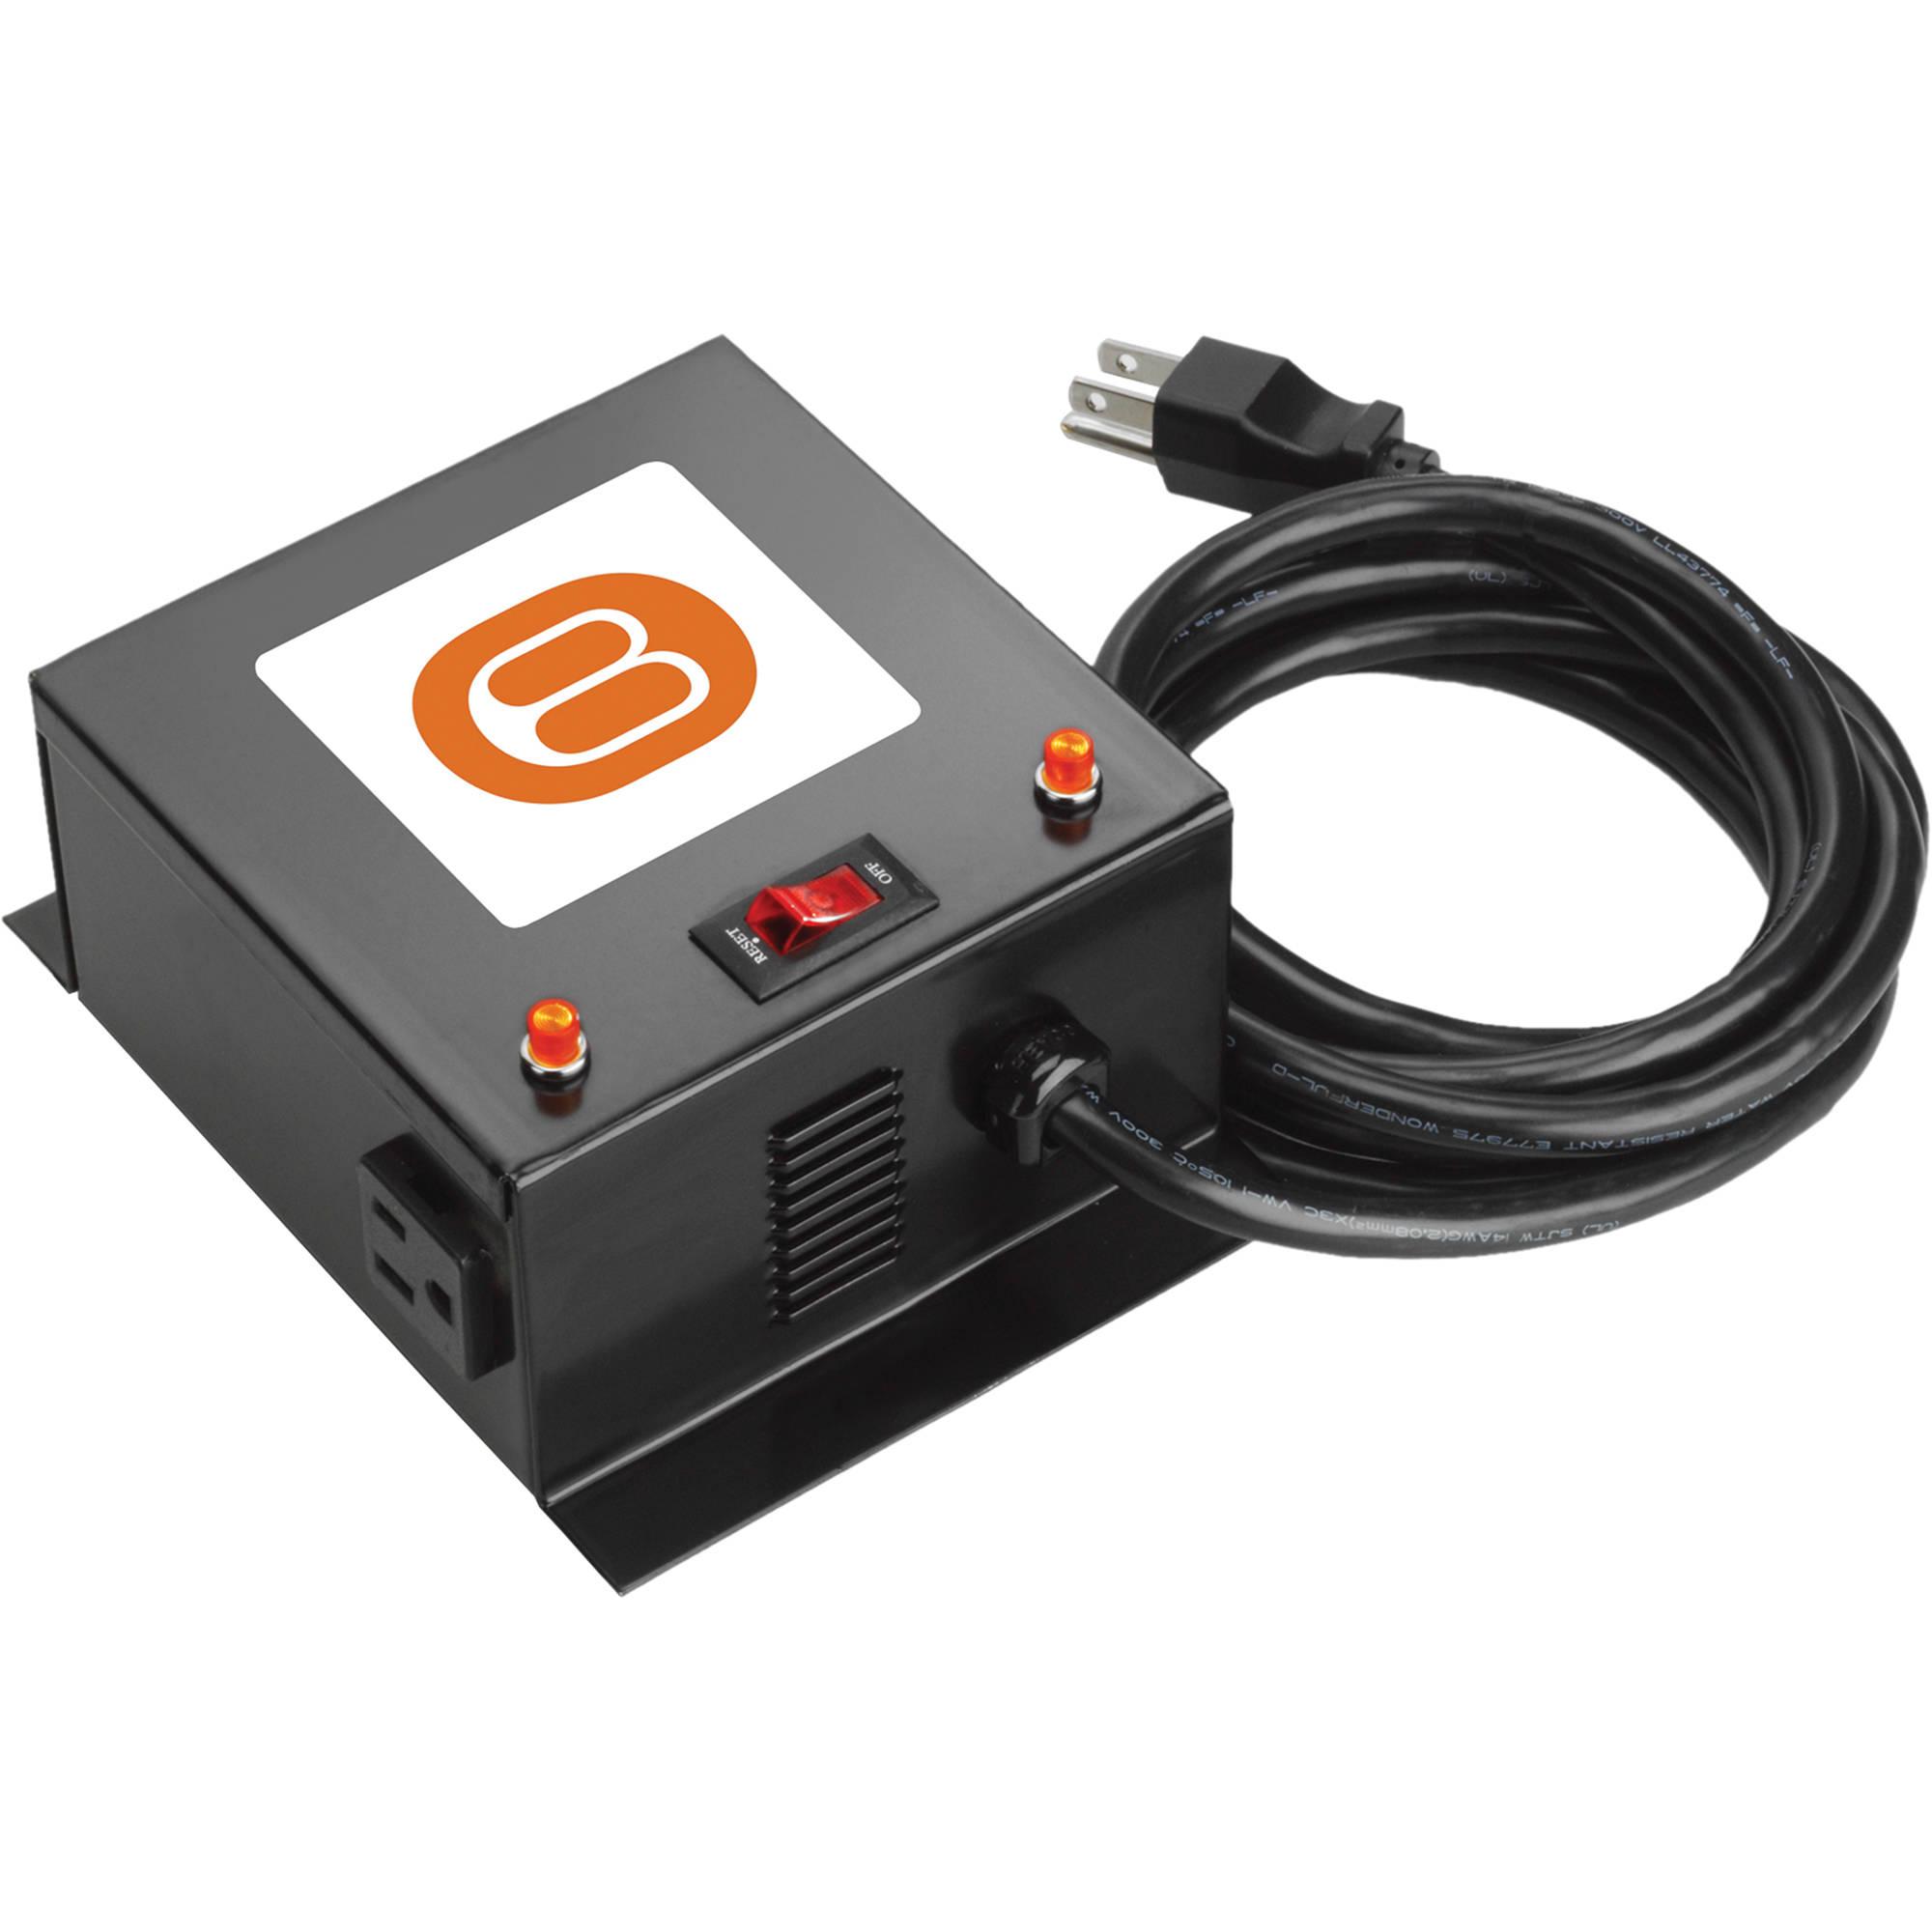 bretford laptop netbook cart accessory digital timer unit lapdt